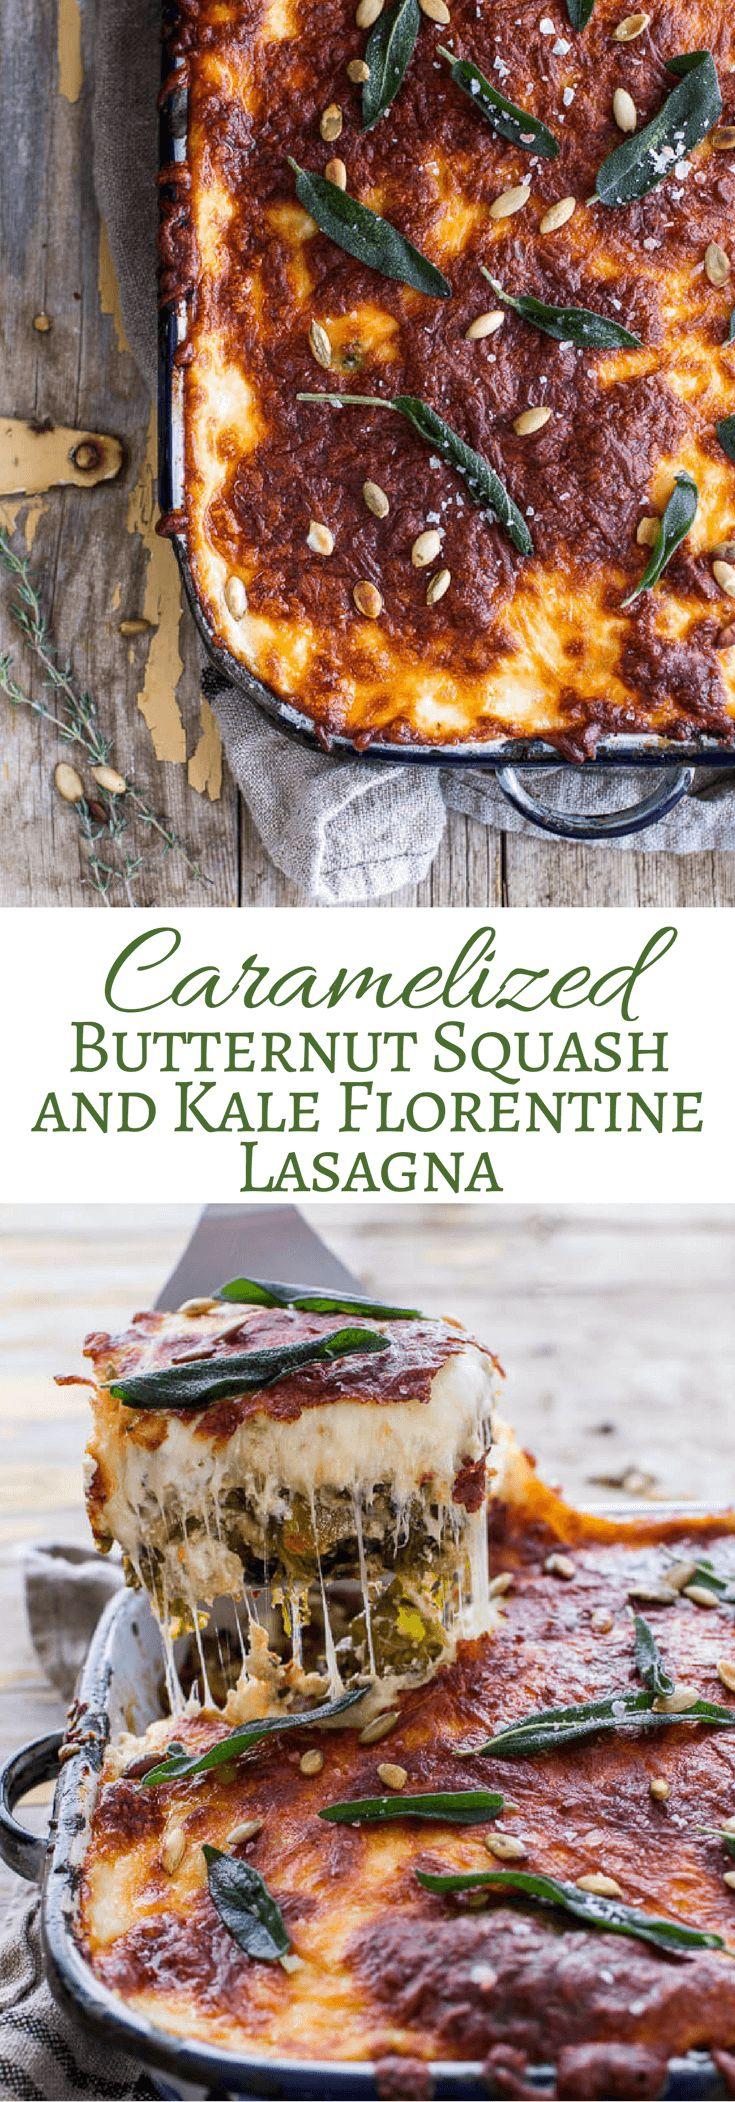 Caramelized Butternut Squash and Kale Florentine Lasagna | halfbakedharvest.com @hbharvest